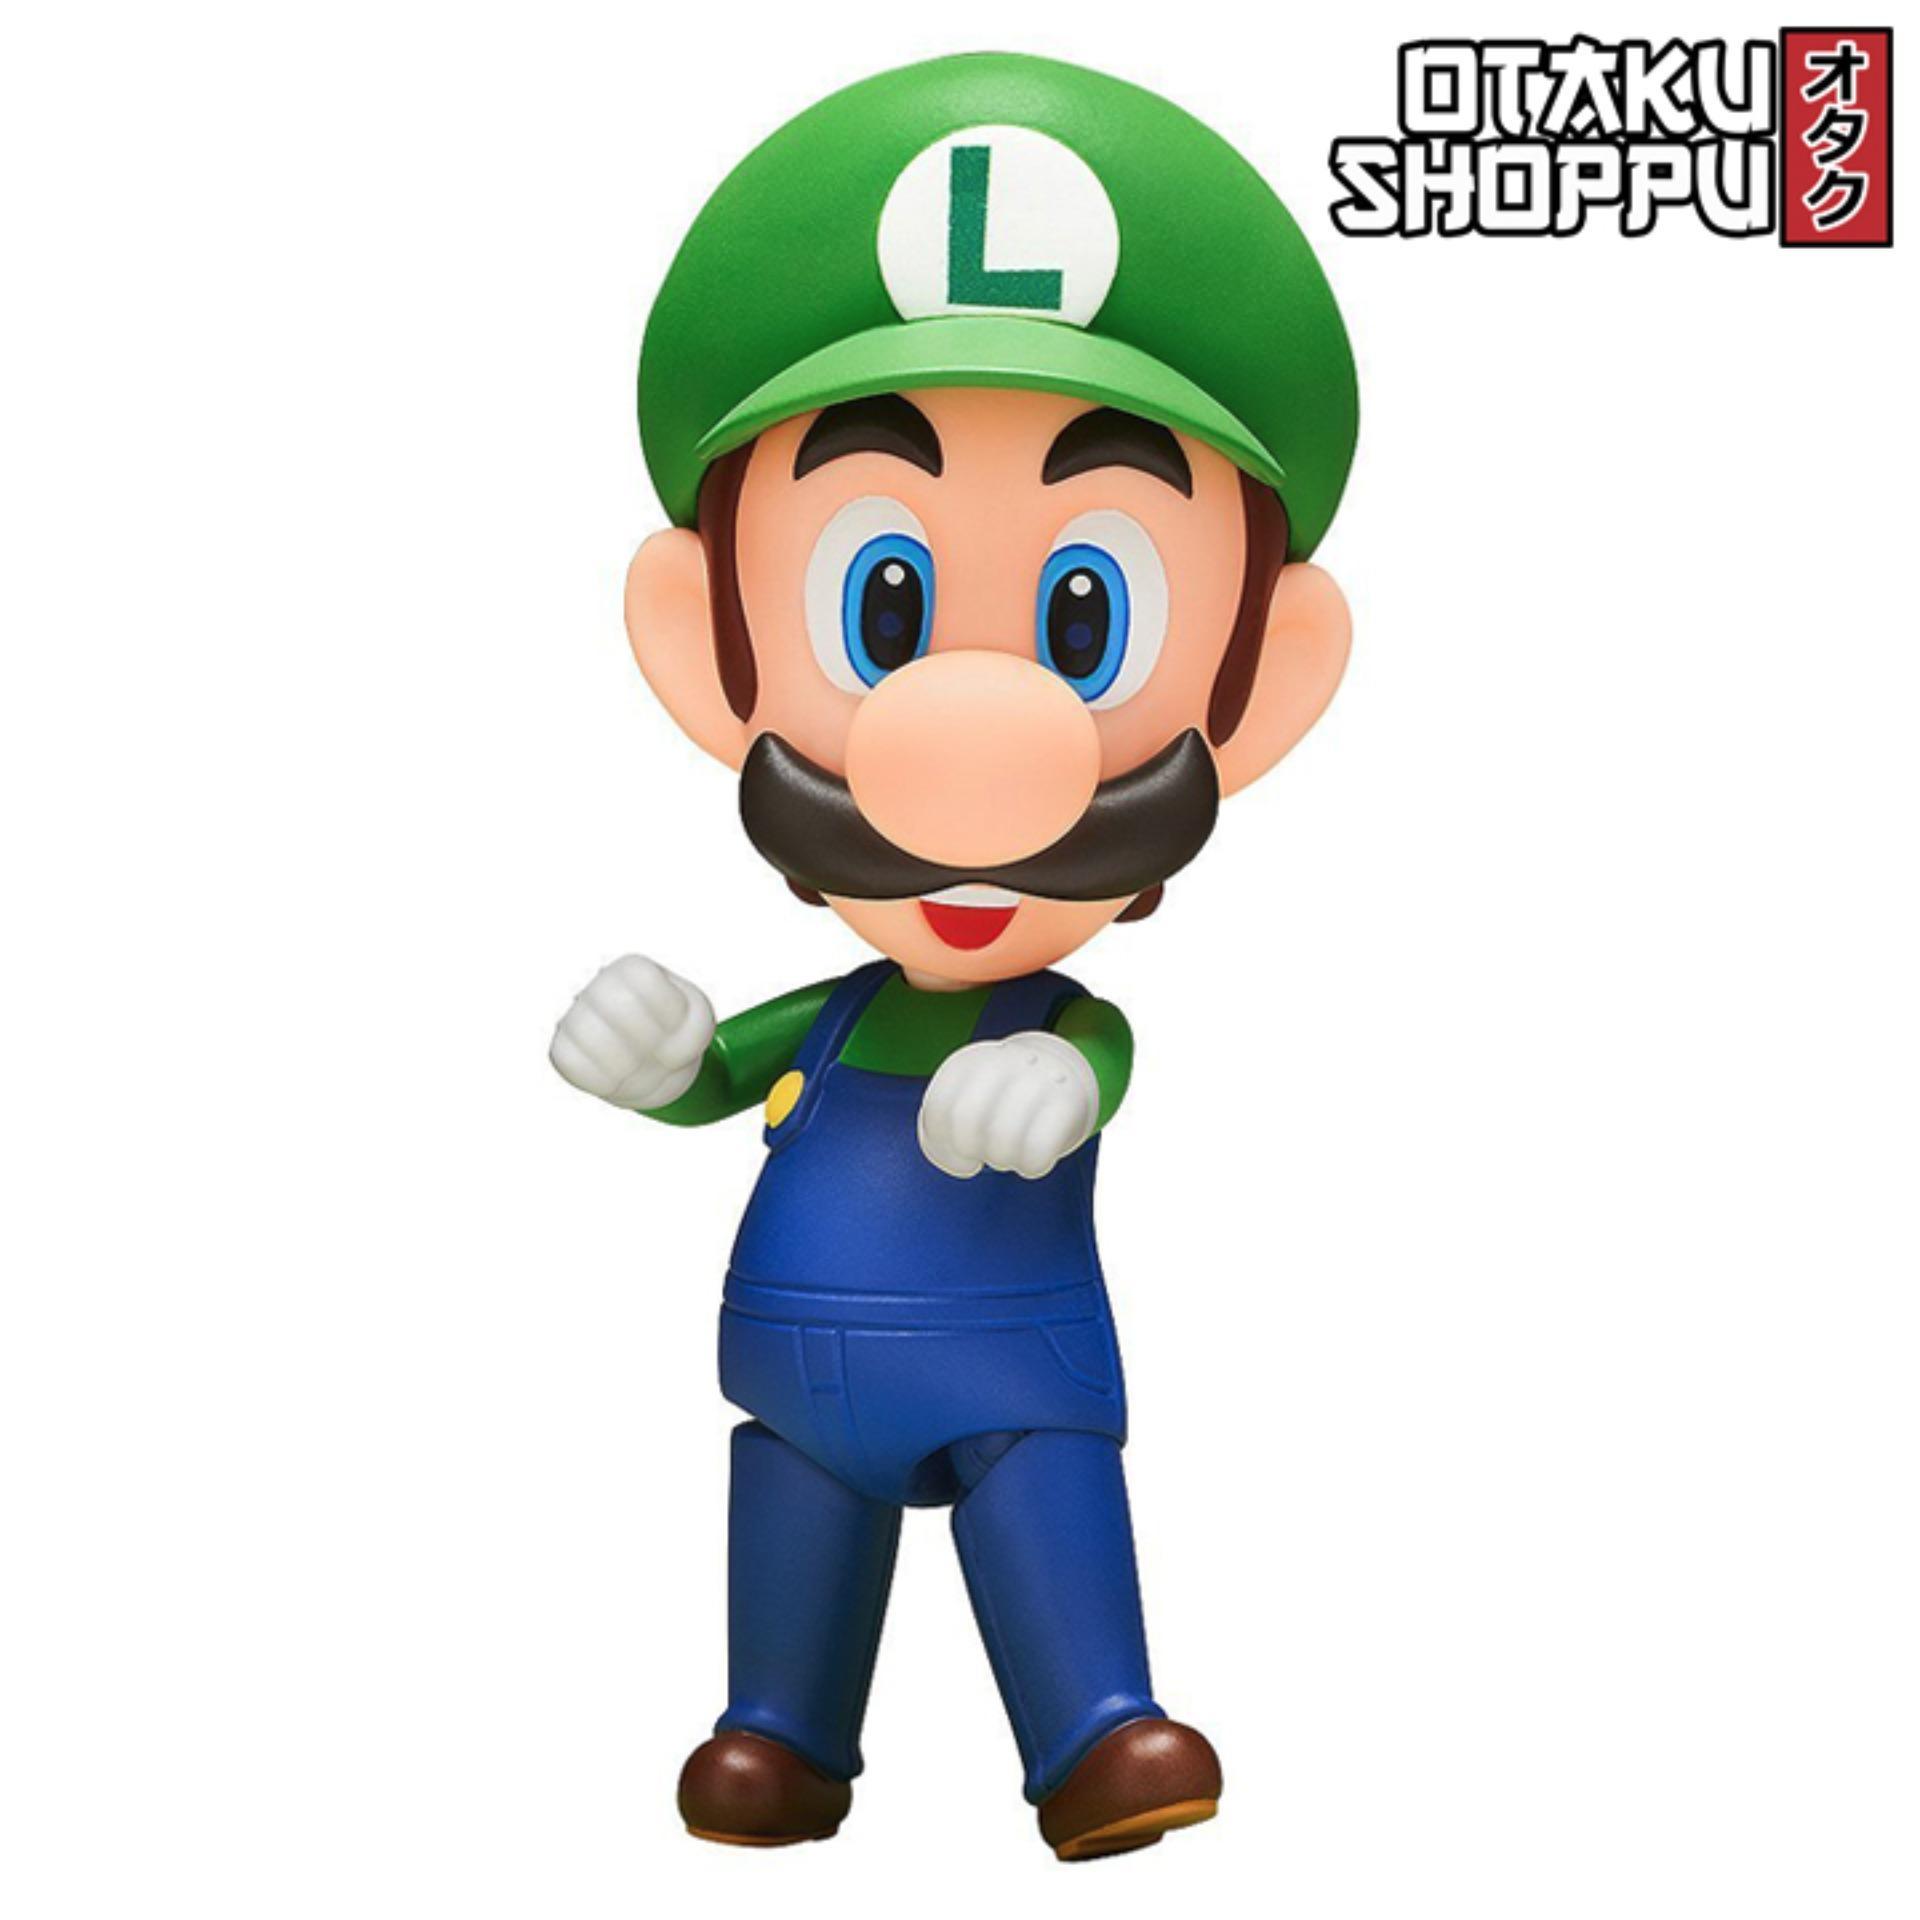 Luigi mini video game figure